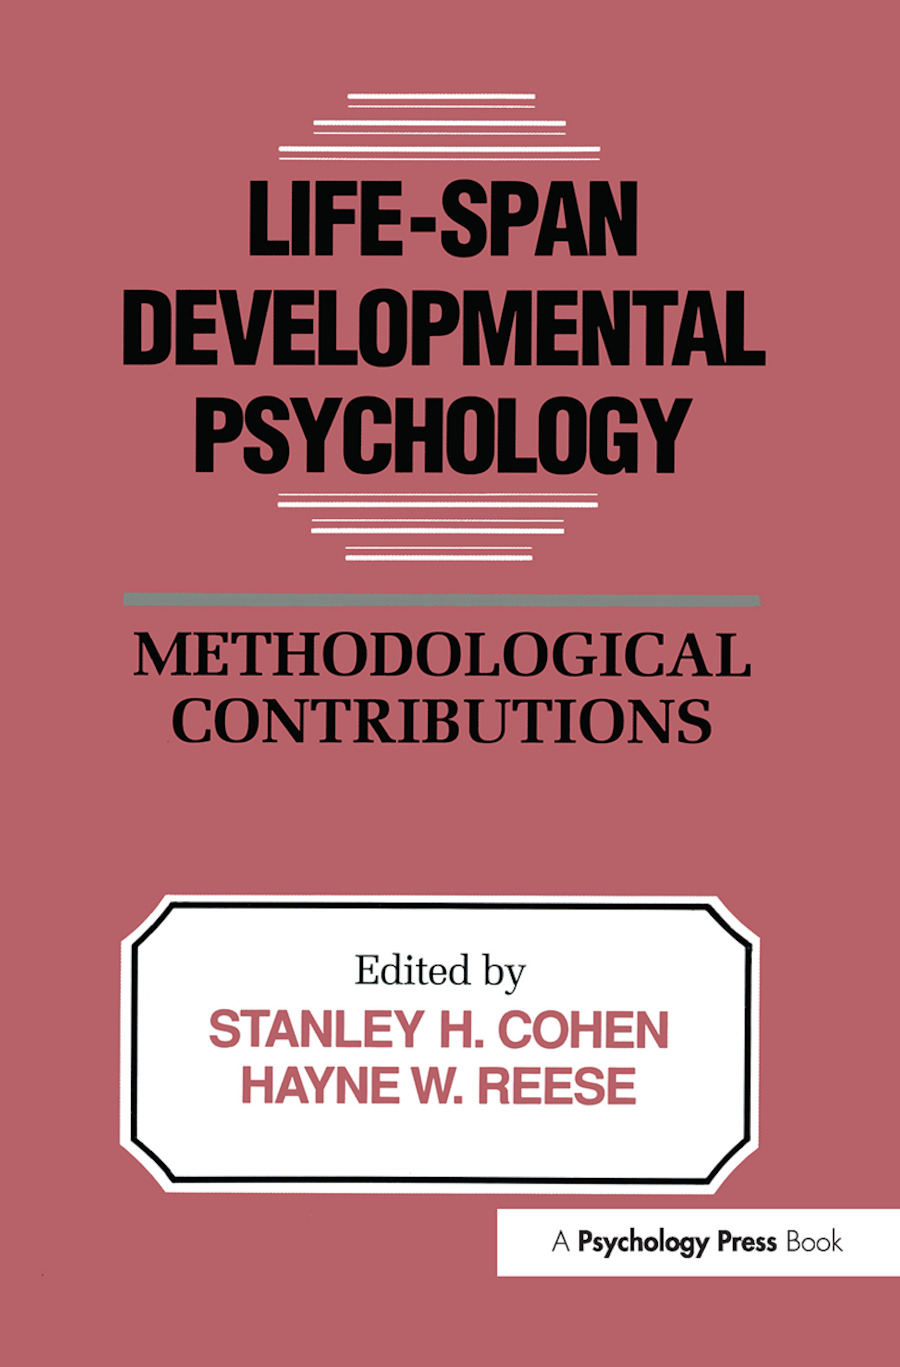 Life-Span Developmental Psychology: Methodological Contributions book cover